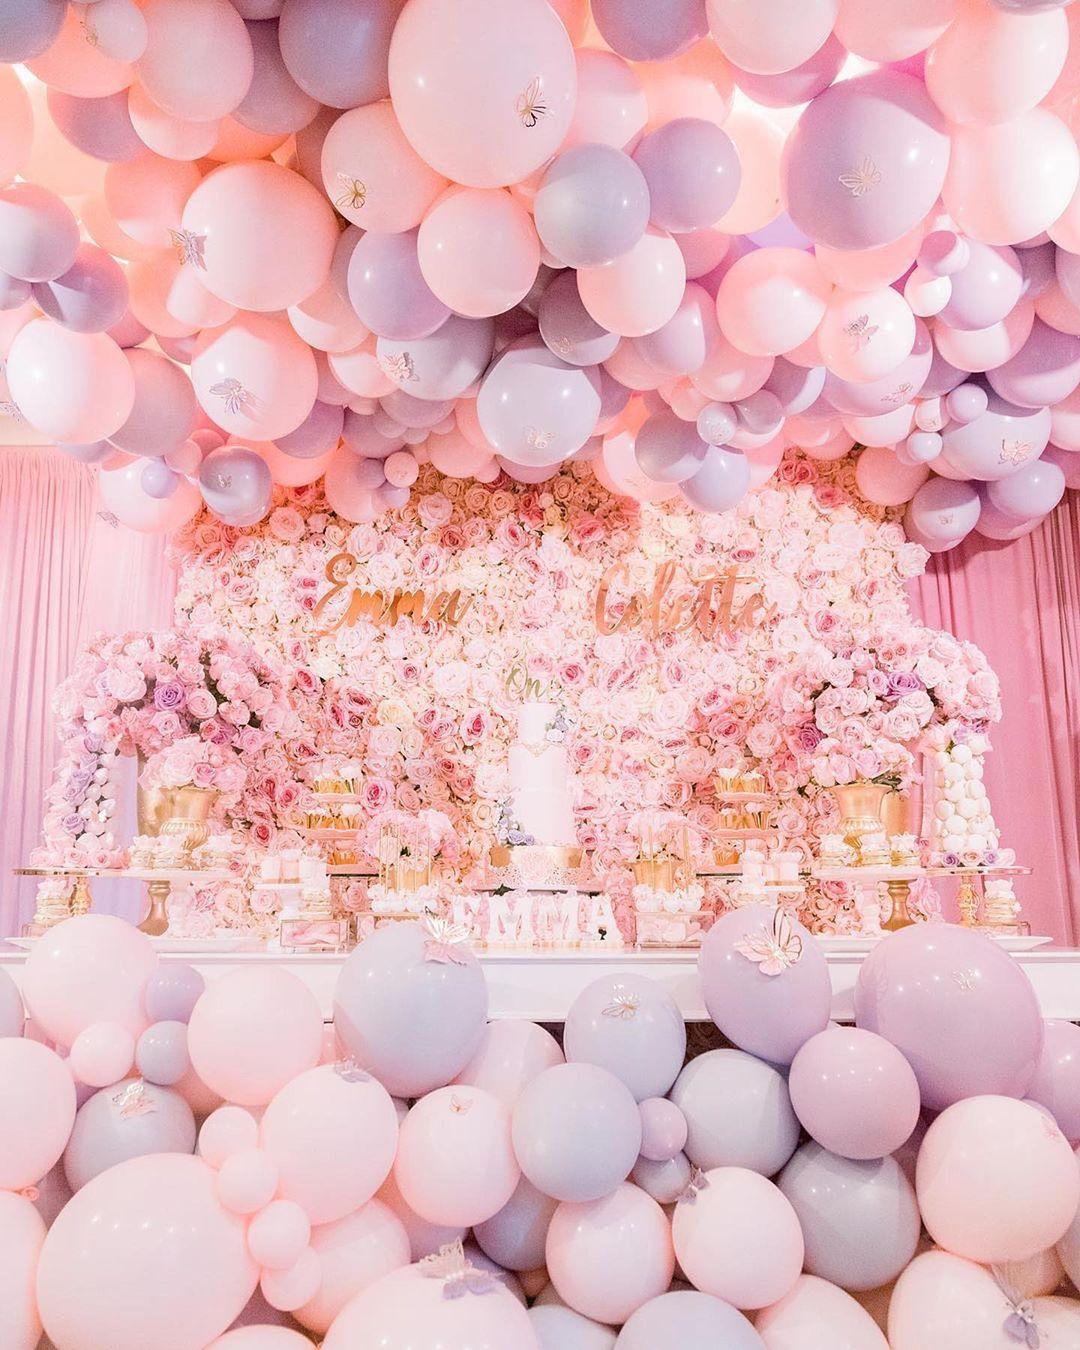 pastel colored balloons at wedding